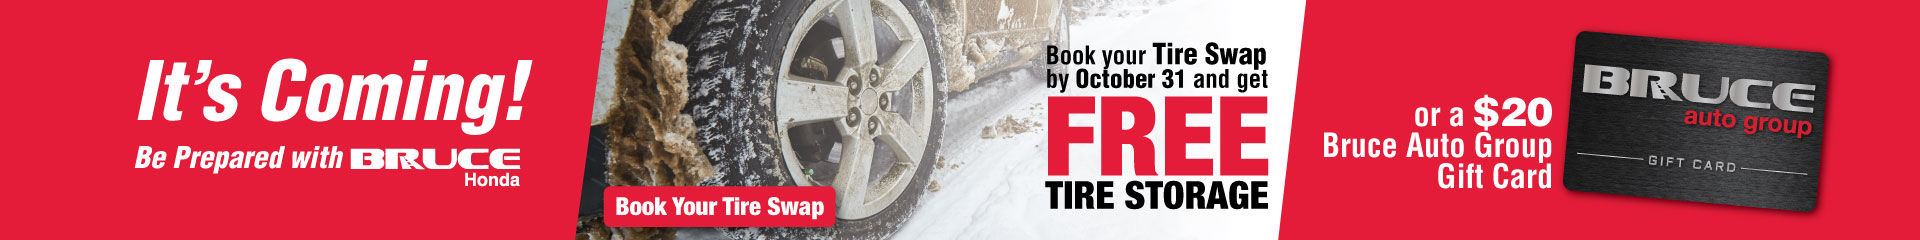 2018-10 Free Tire Storage